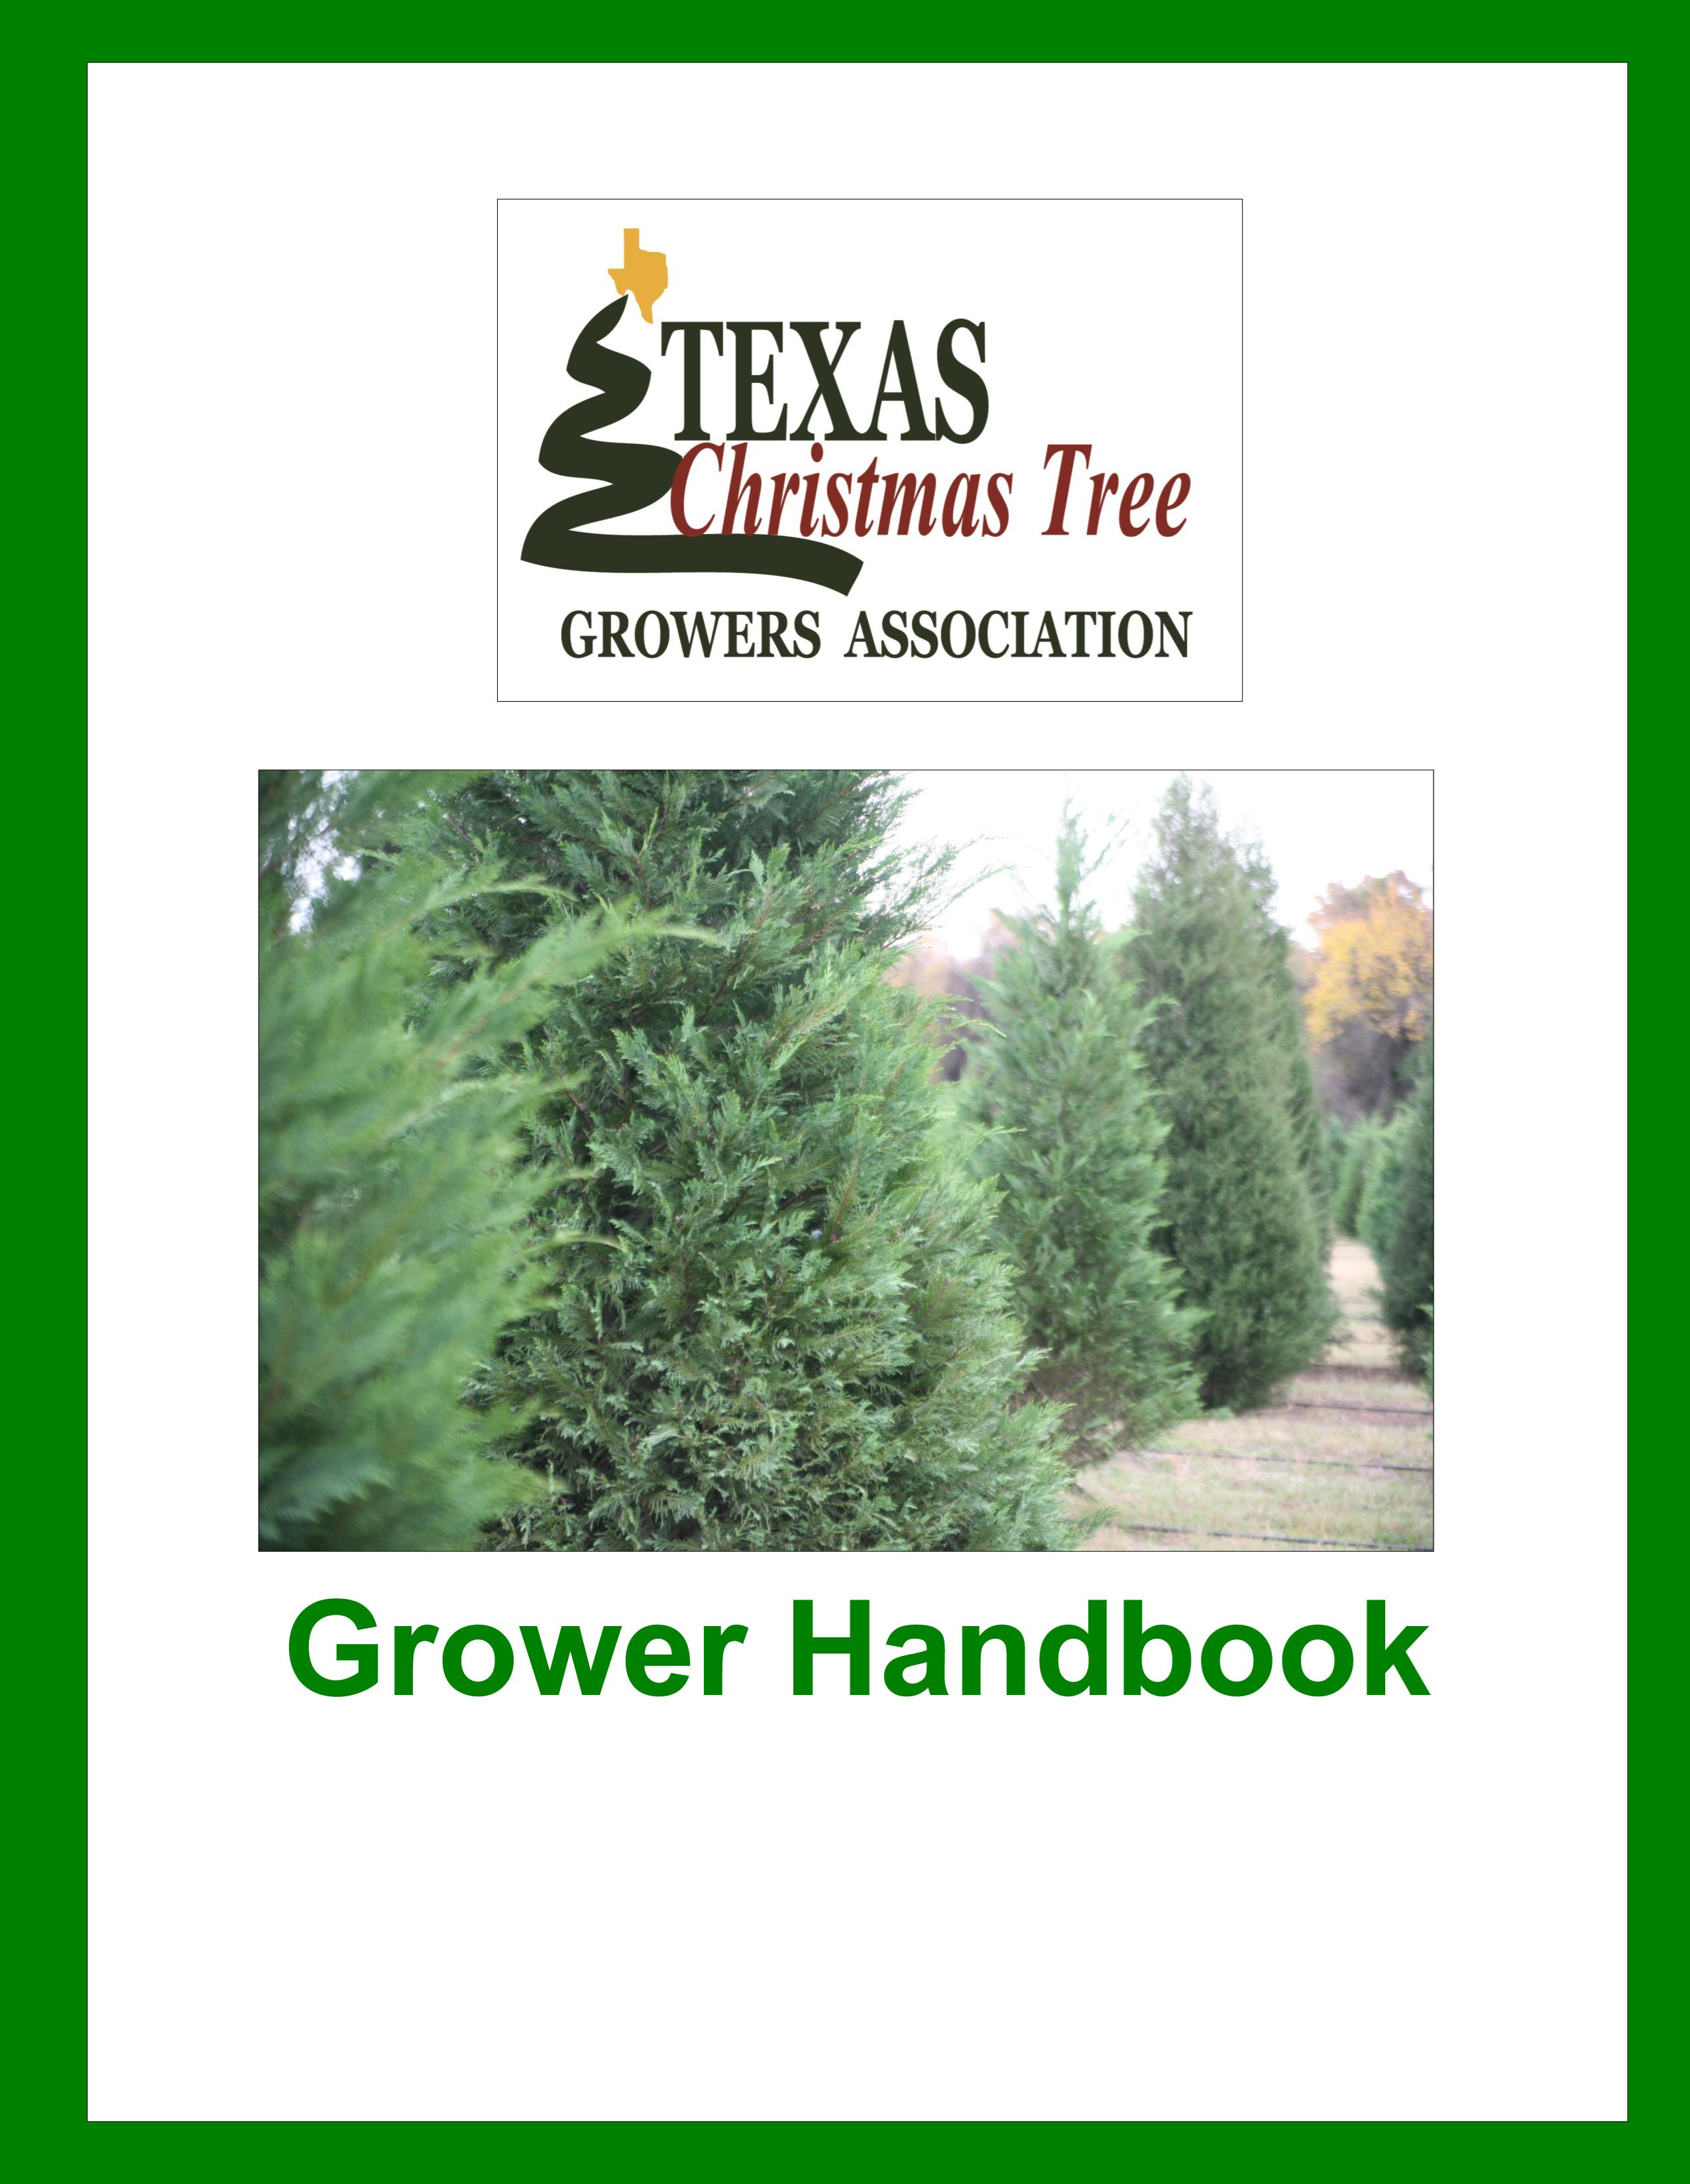 Tctga Growers Handbook Page In 2020 Growers Christmas Tree Farm Texas Christmas Tree